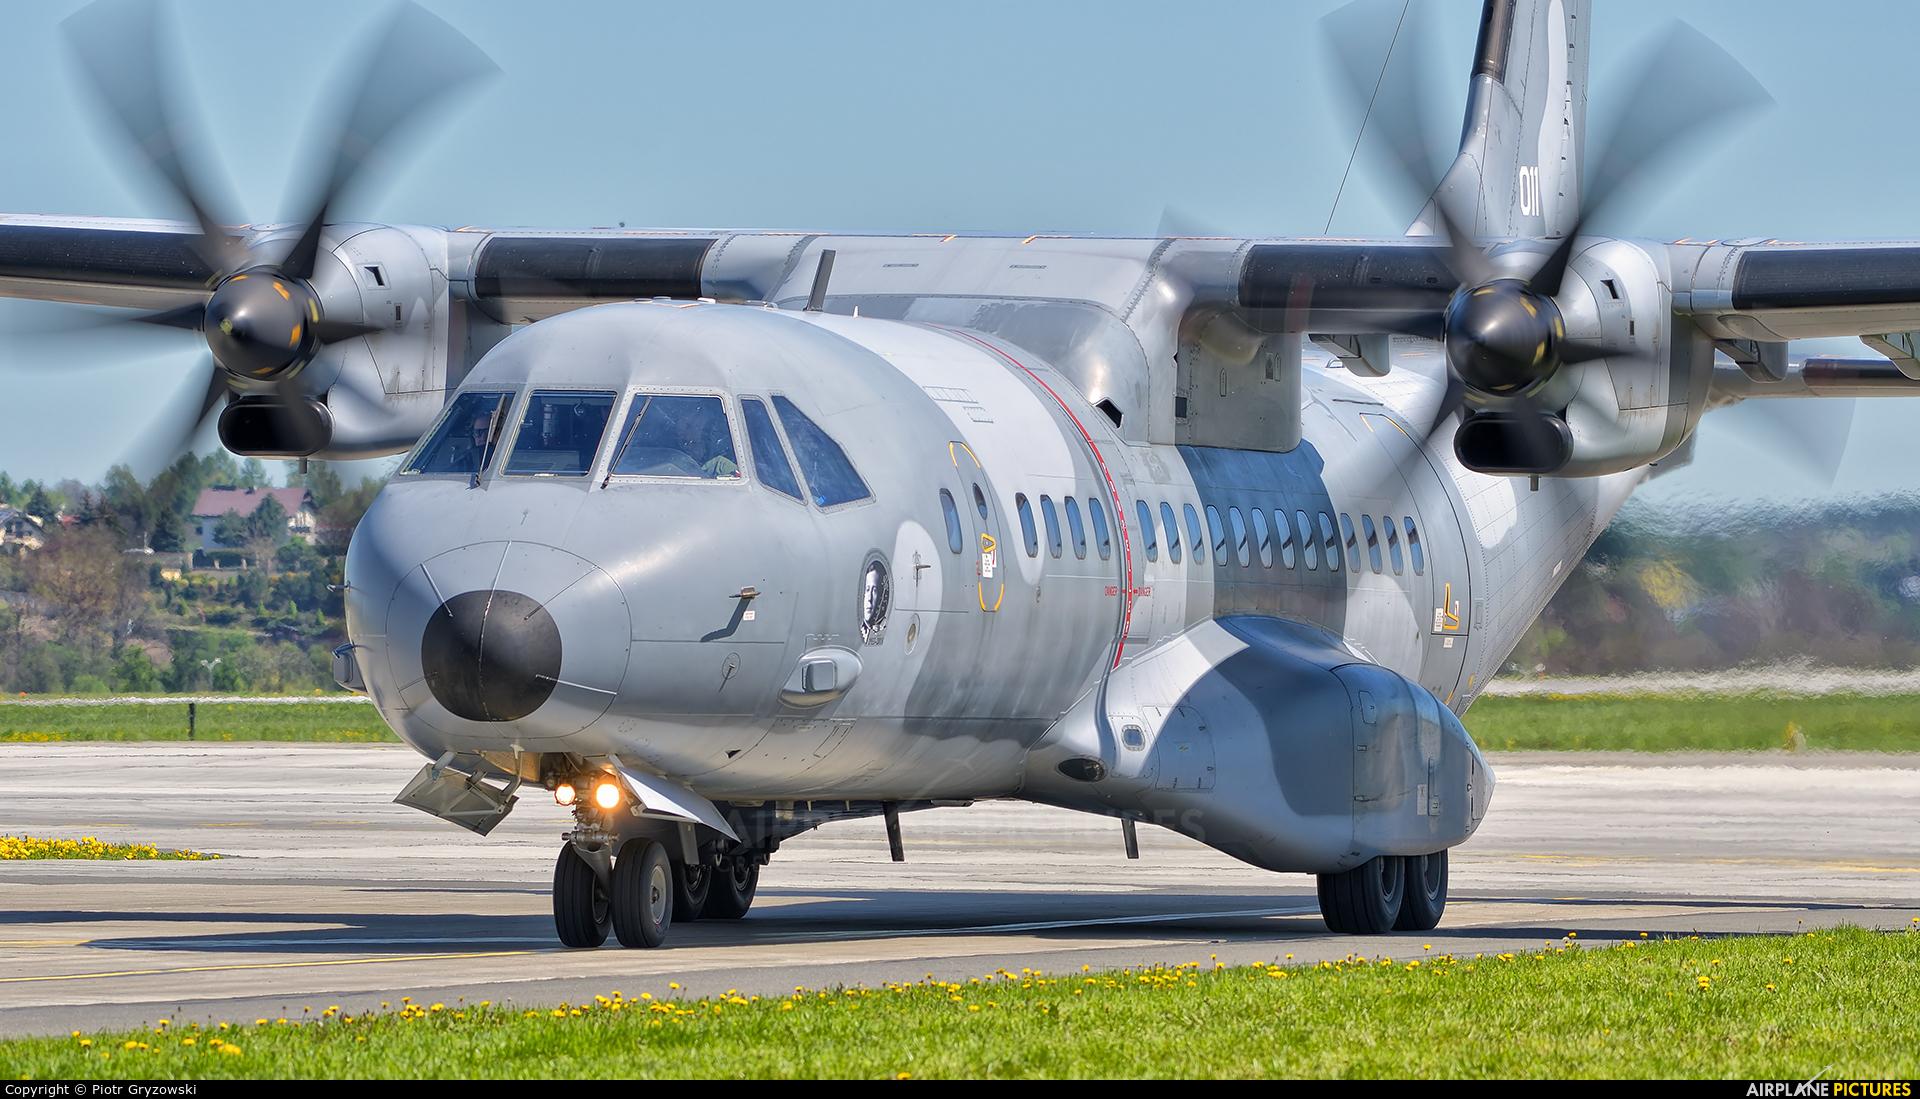 Poland - Air Force 011 aircraft at Kraków - John Paul II Intl